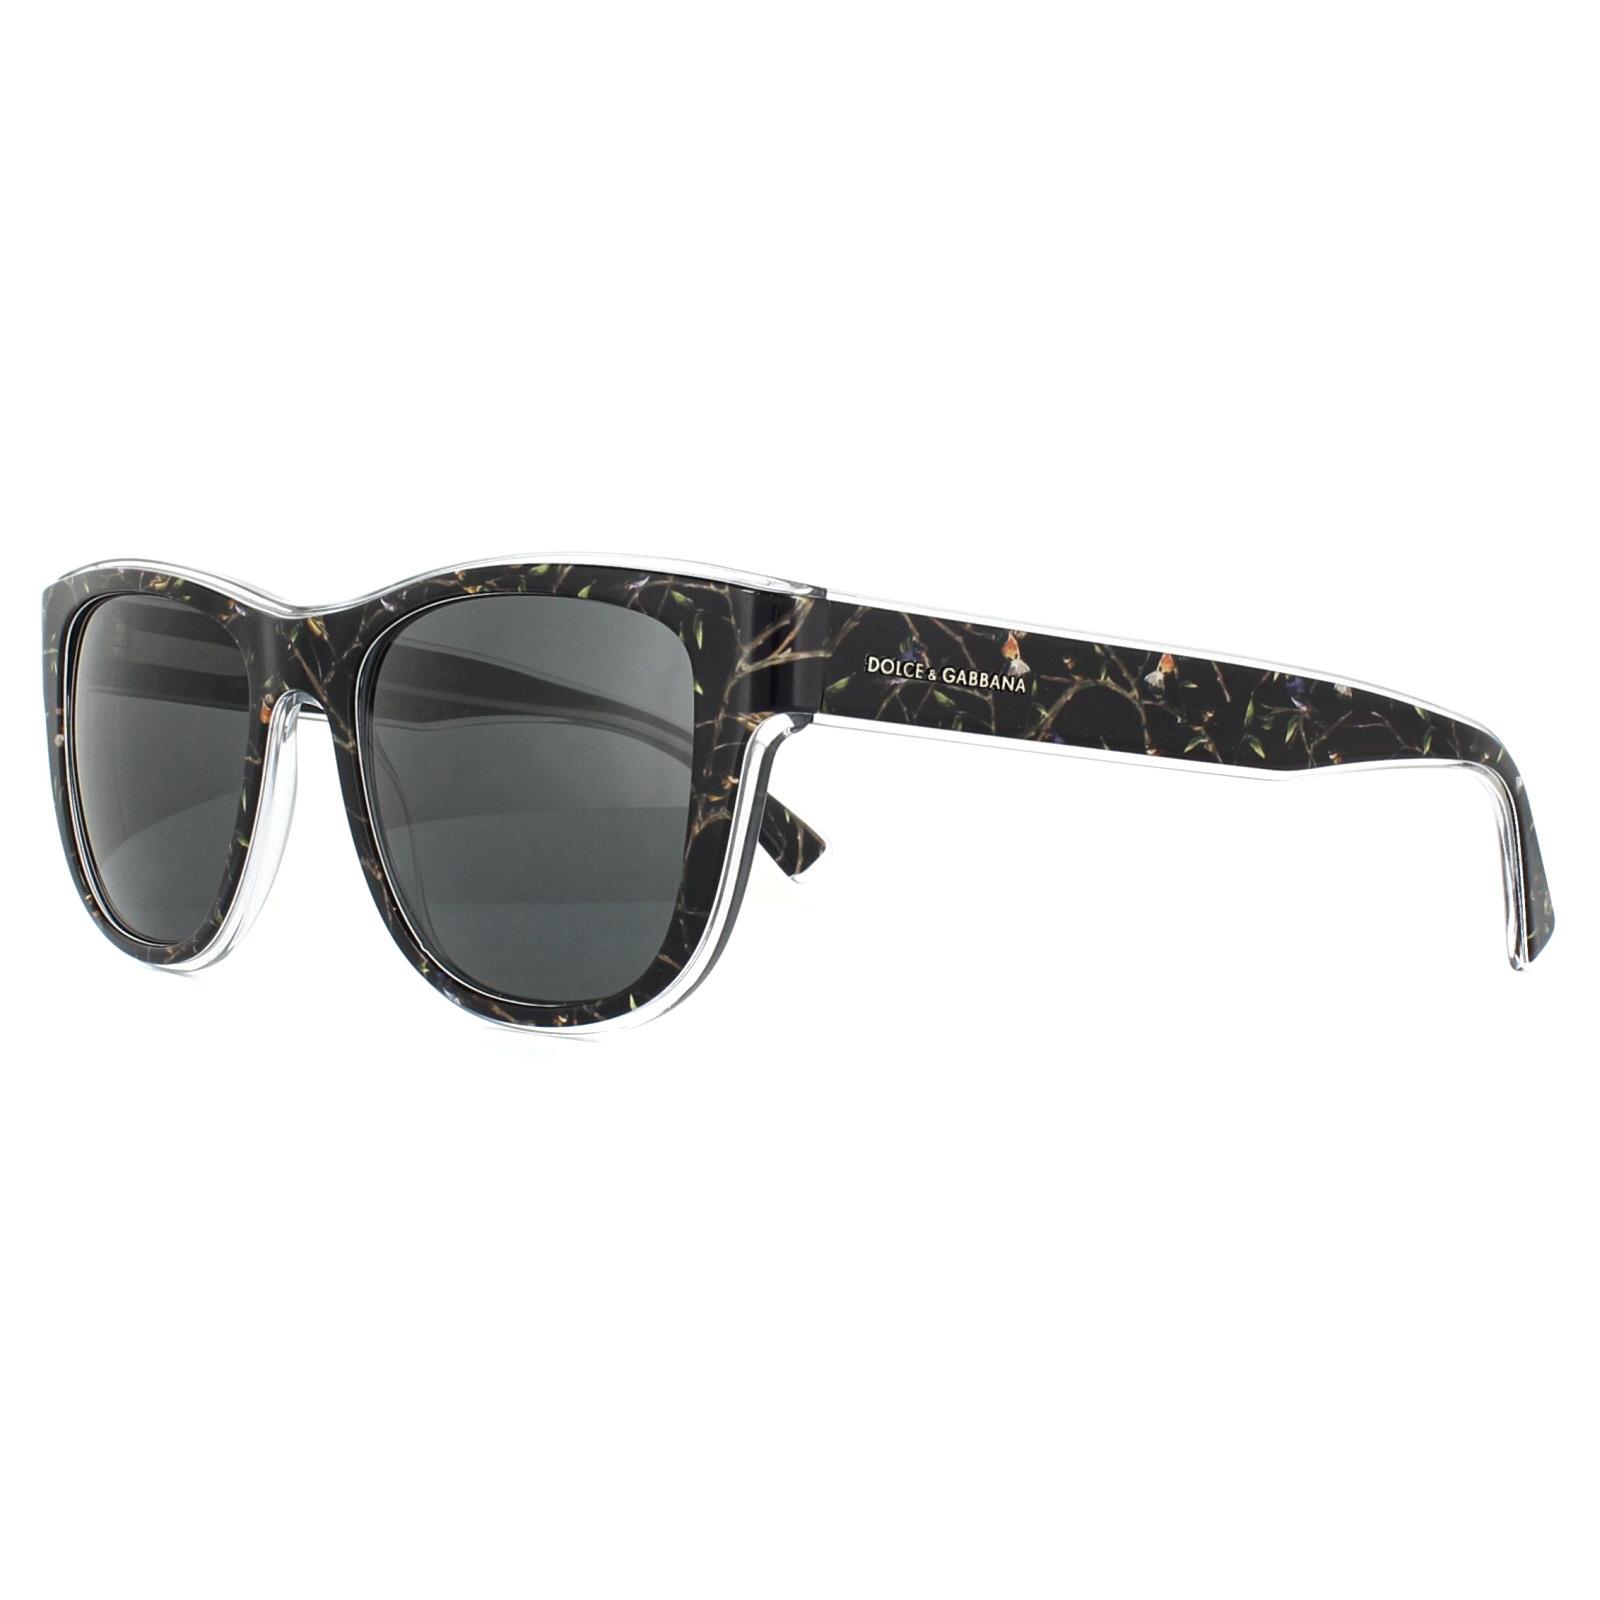 6d66206ba424 Sentinel Dolce   Gabbana Sunglasses 4284 305387 Black Birds Grey